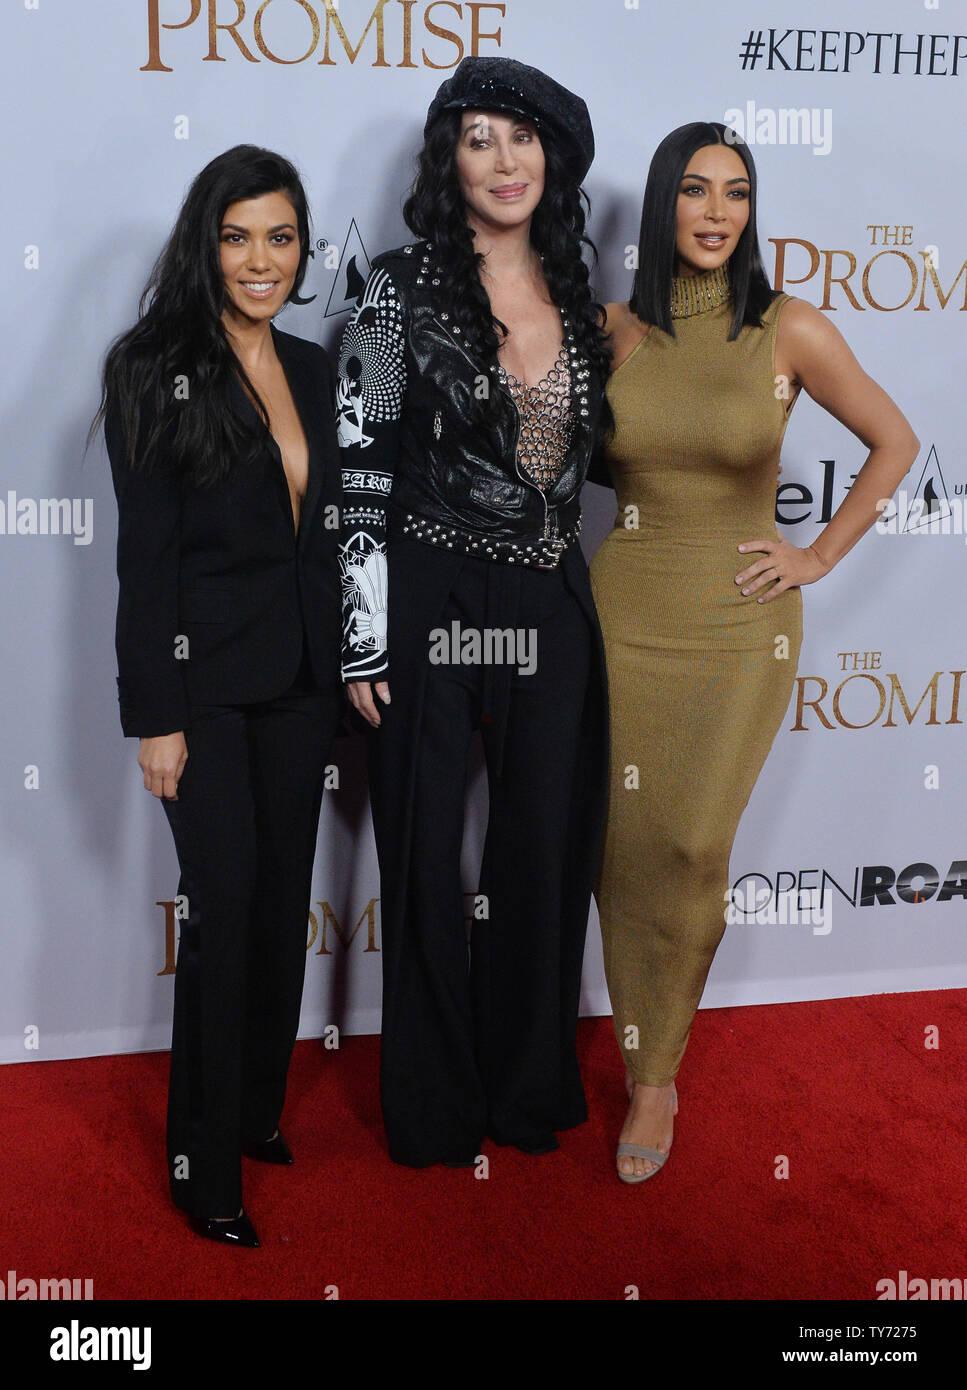 TV personalities Kourtney Kardashian (L) and Kim Kardashian